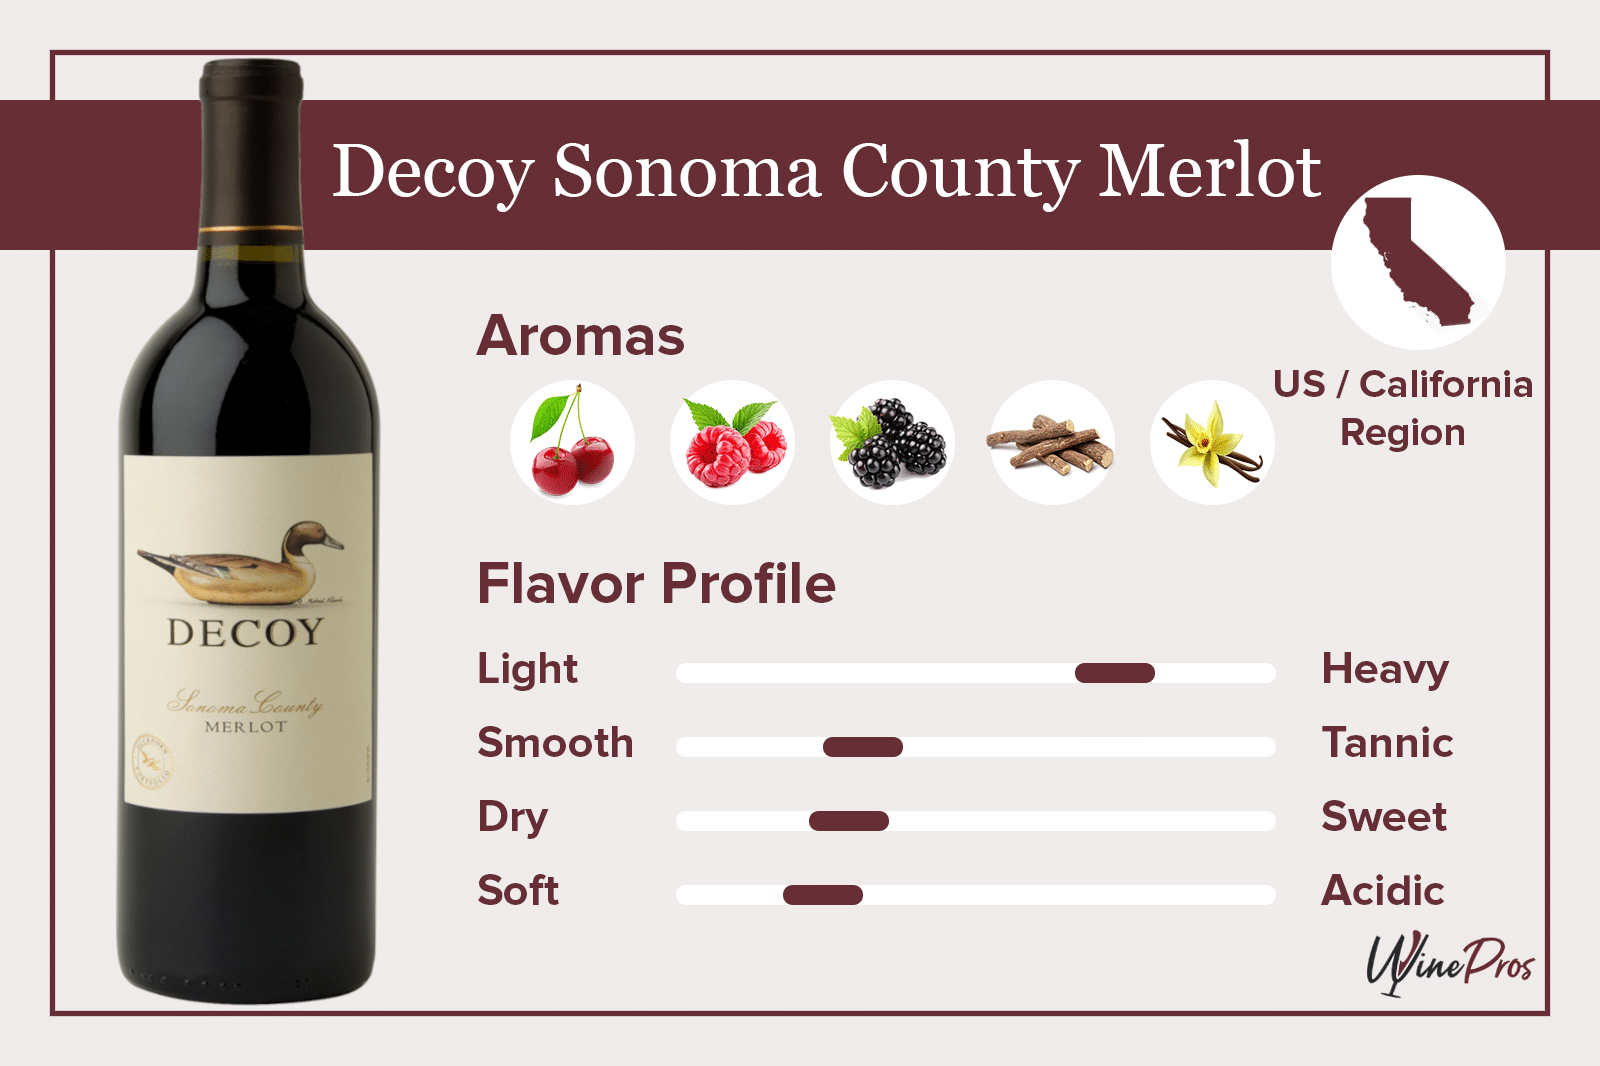 Decoy Sonoma County Merlot Featured